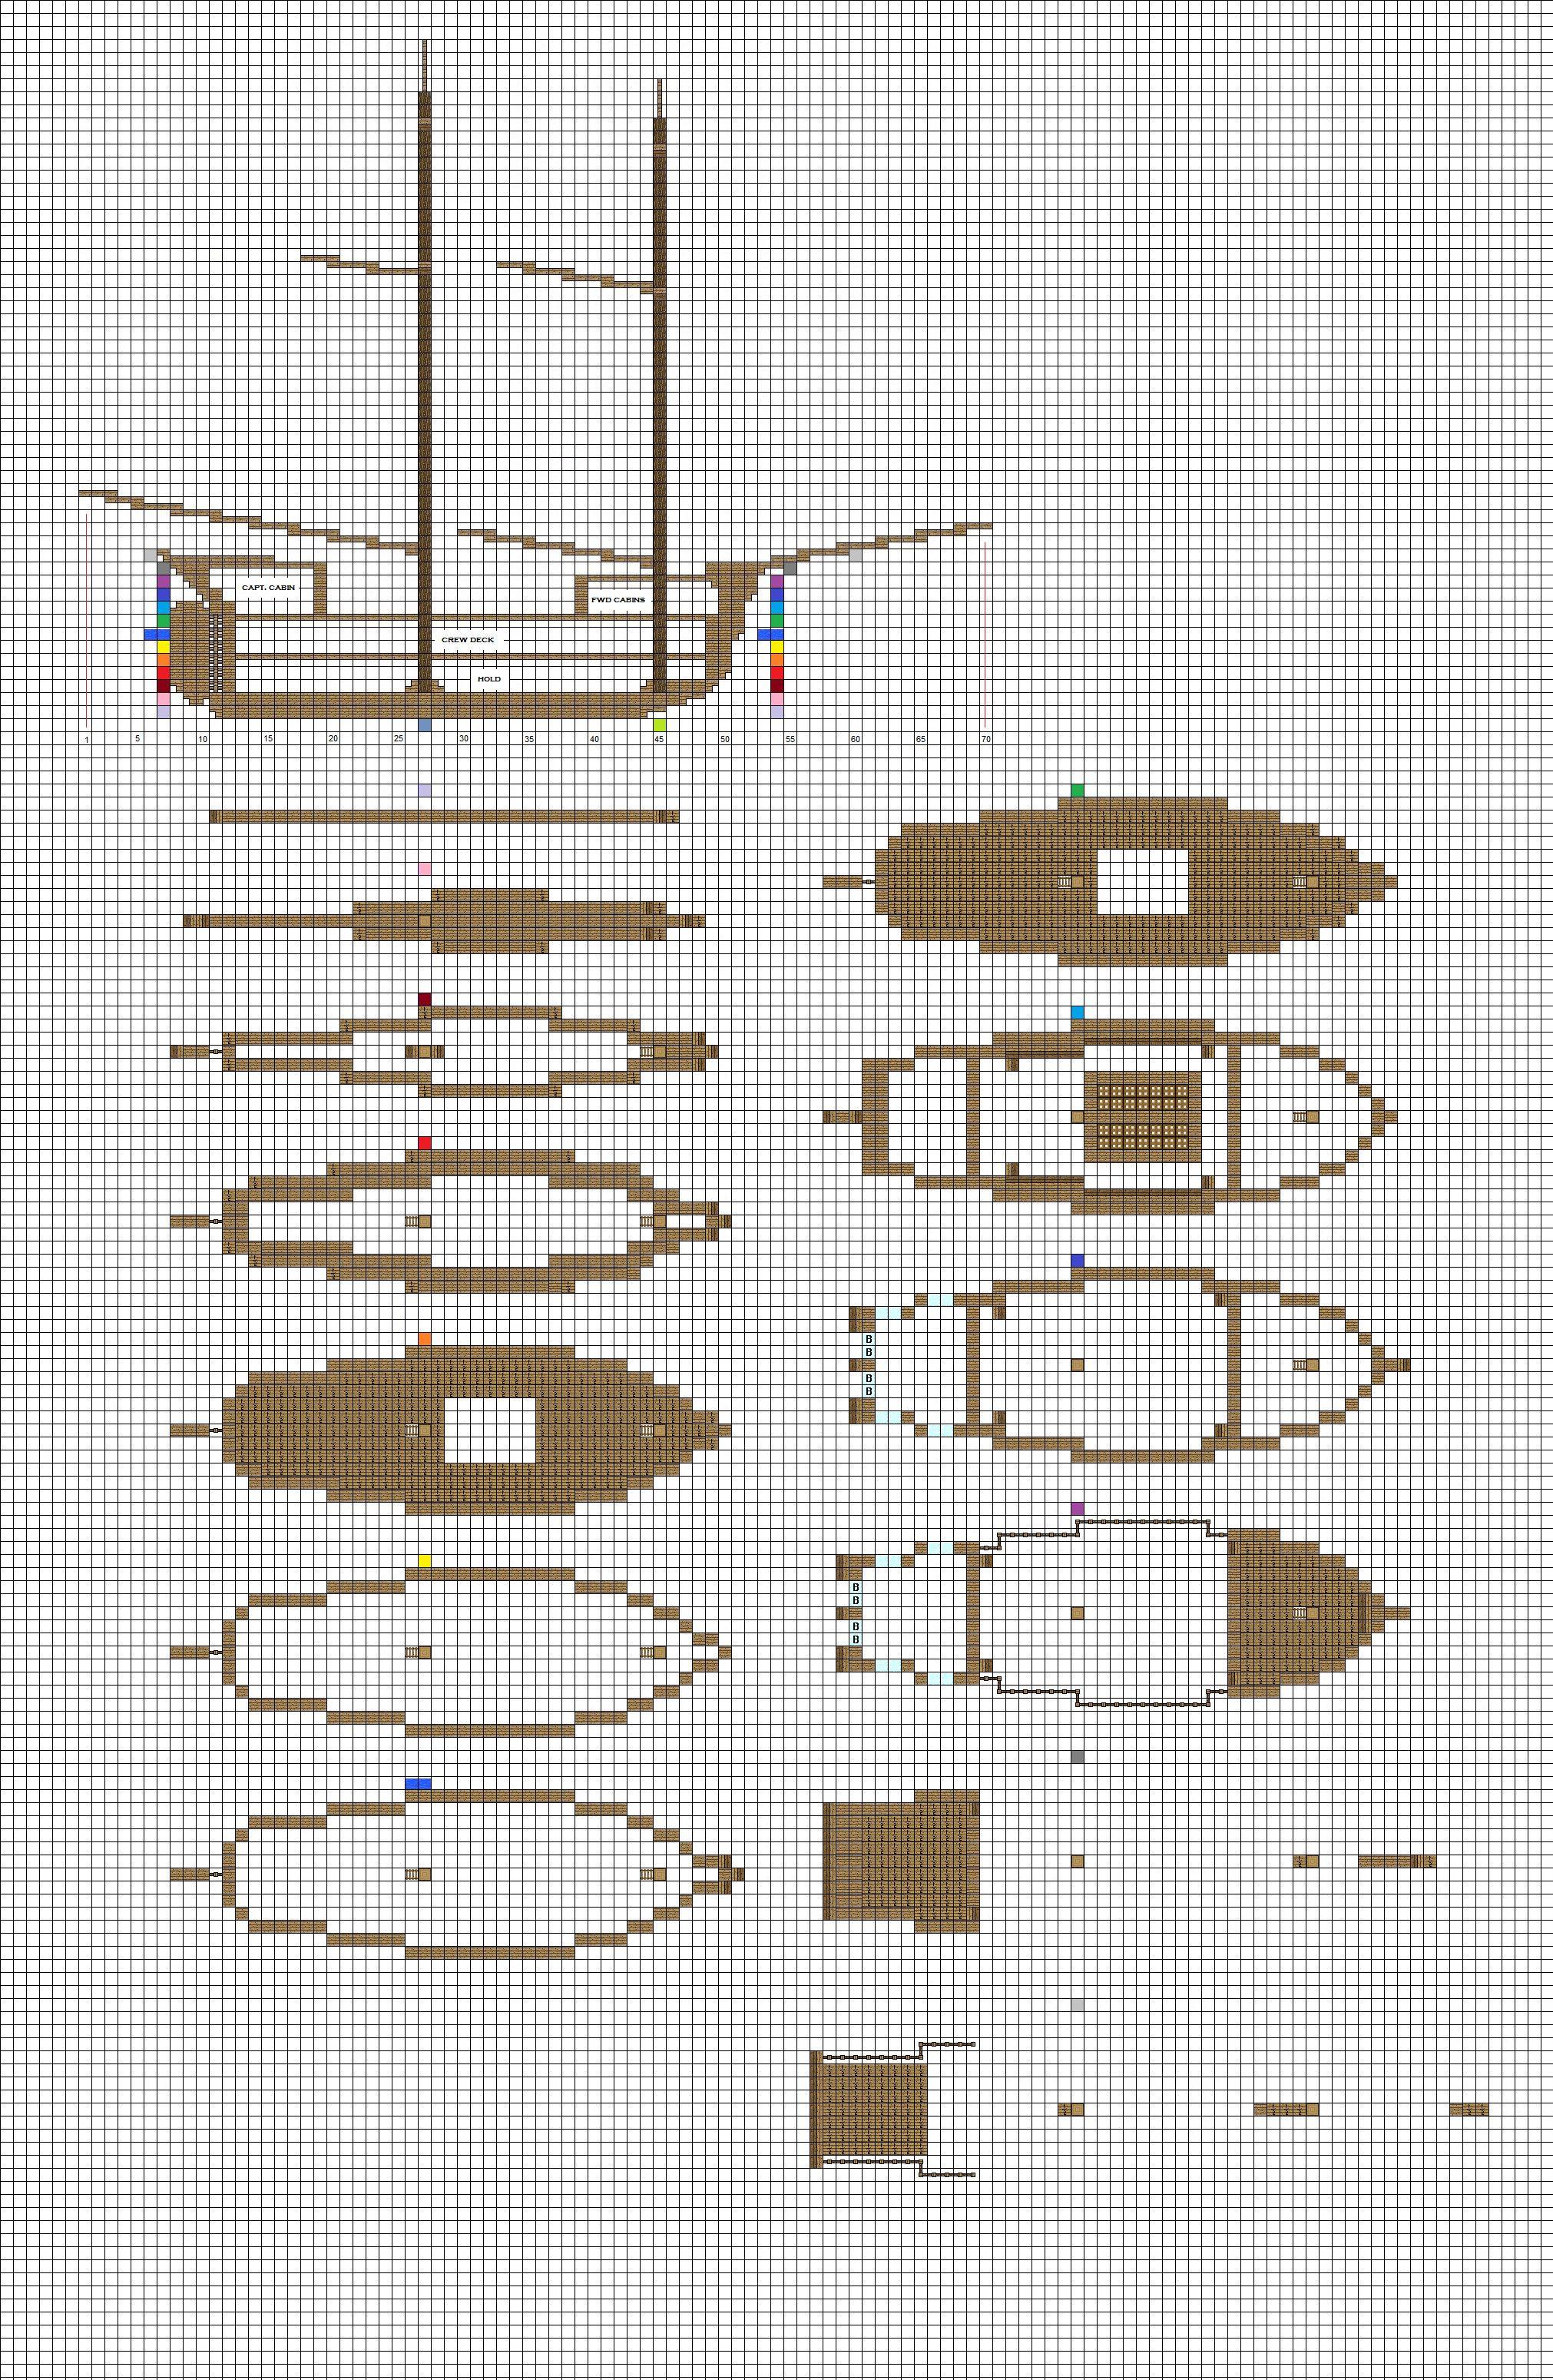 Minecraft sailing Brig plans pg1 hull by ColtCoyote deviantart com on   DeviantArt. Minecraft sailing Brig plans pg1 hull by ColtCoyote deviantart com